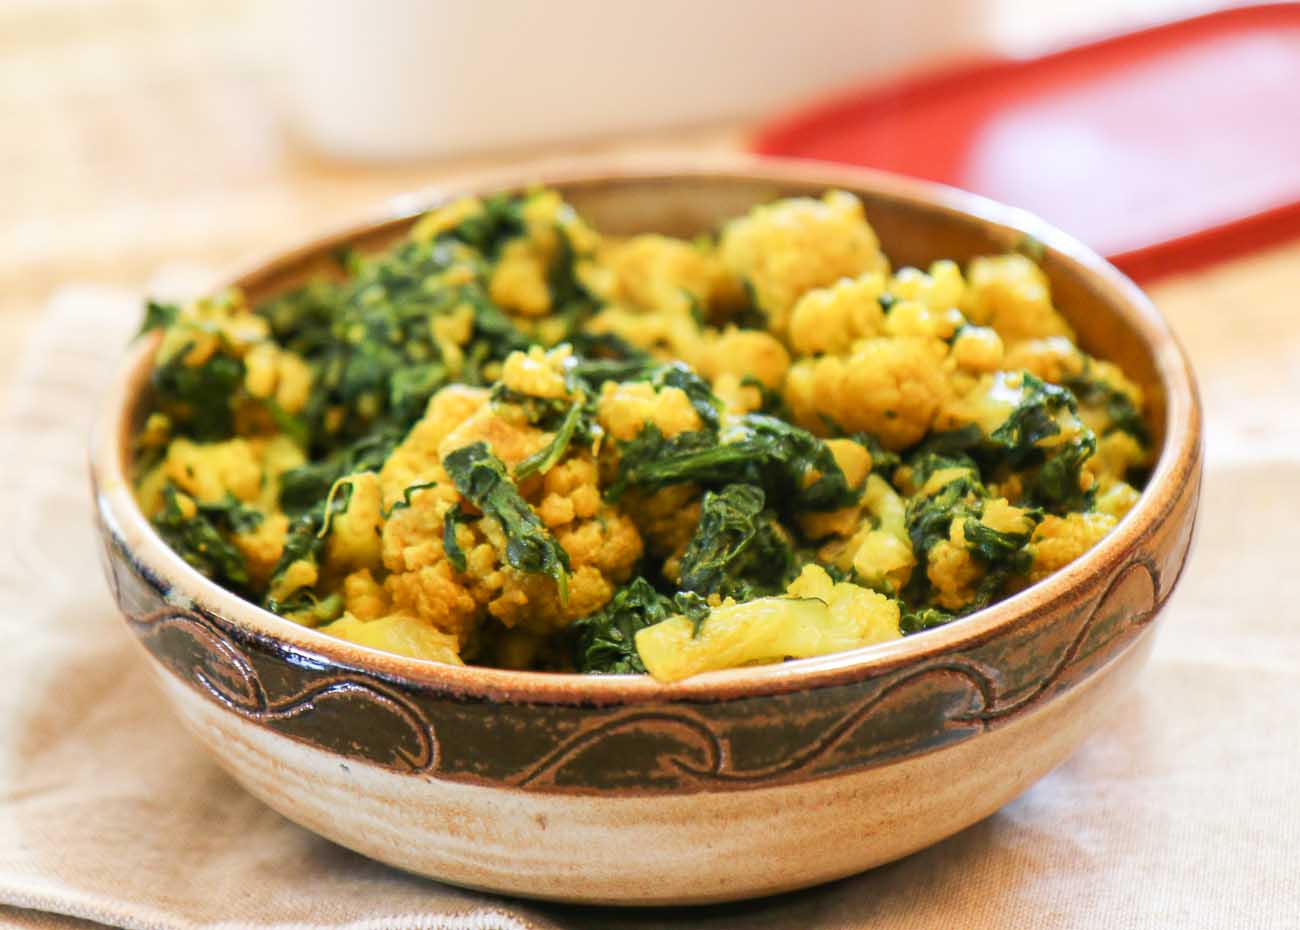 Palak gobi sabzi recipe indian style cauliflower with spinach by palak gobi sabzi recipe indian style cauliflower with spinach forumfinder Gallery